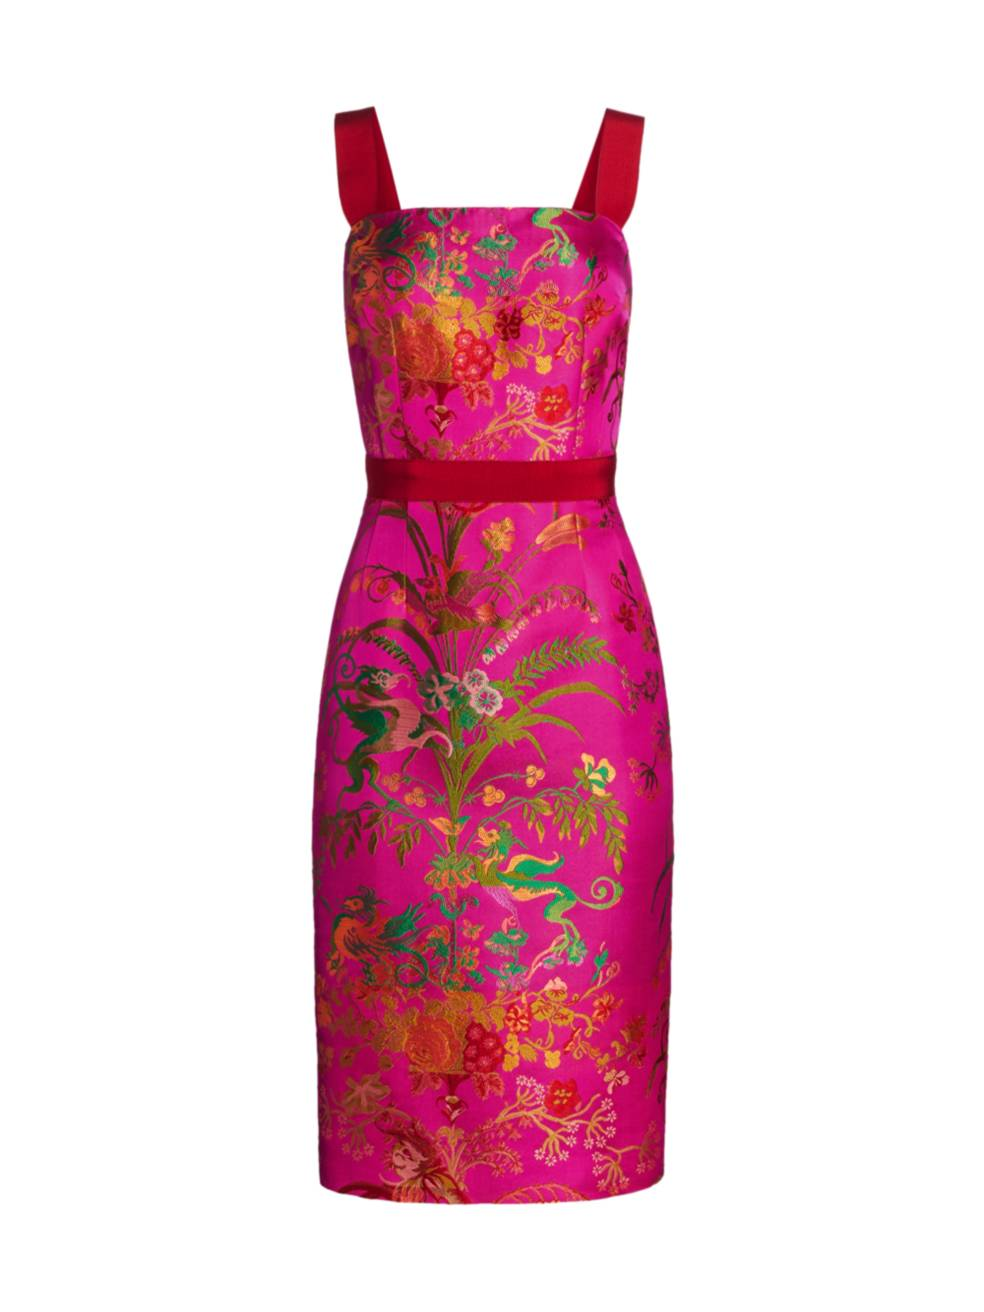 ETRO Sleeveless Floral Jacquard Dress